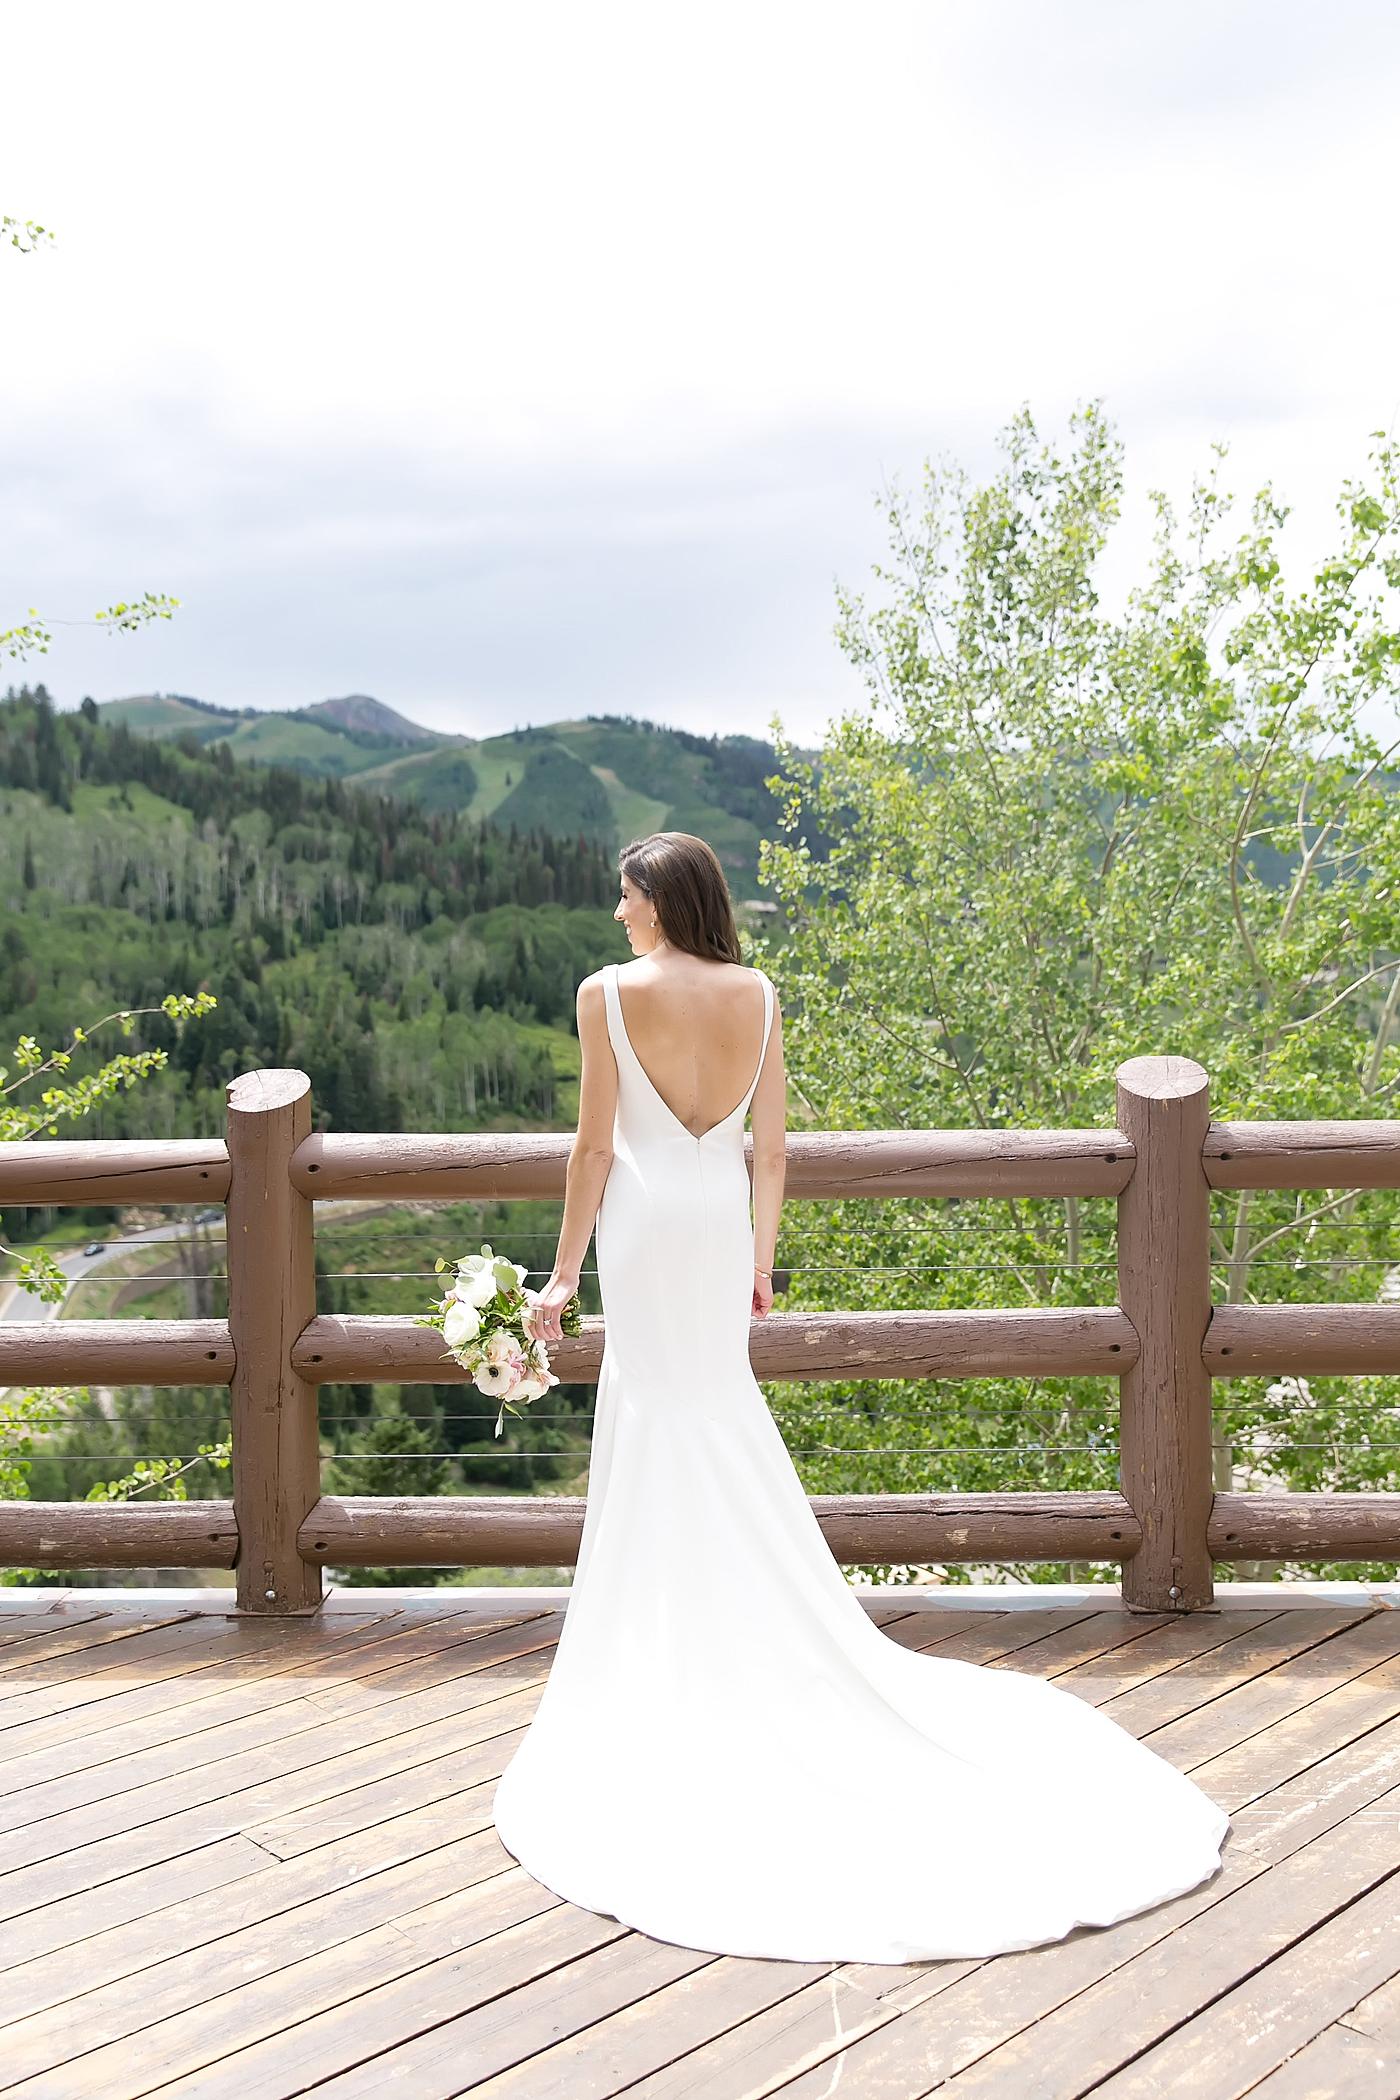 Romantic Mountain Wedding_Deer Valley Weddings_Park City Wedding Planner_MelissaFancy_0079.jpg